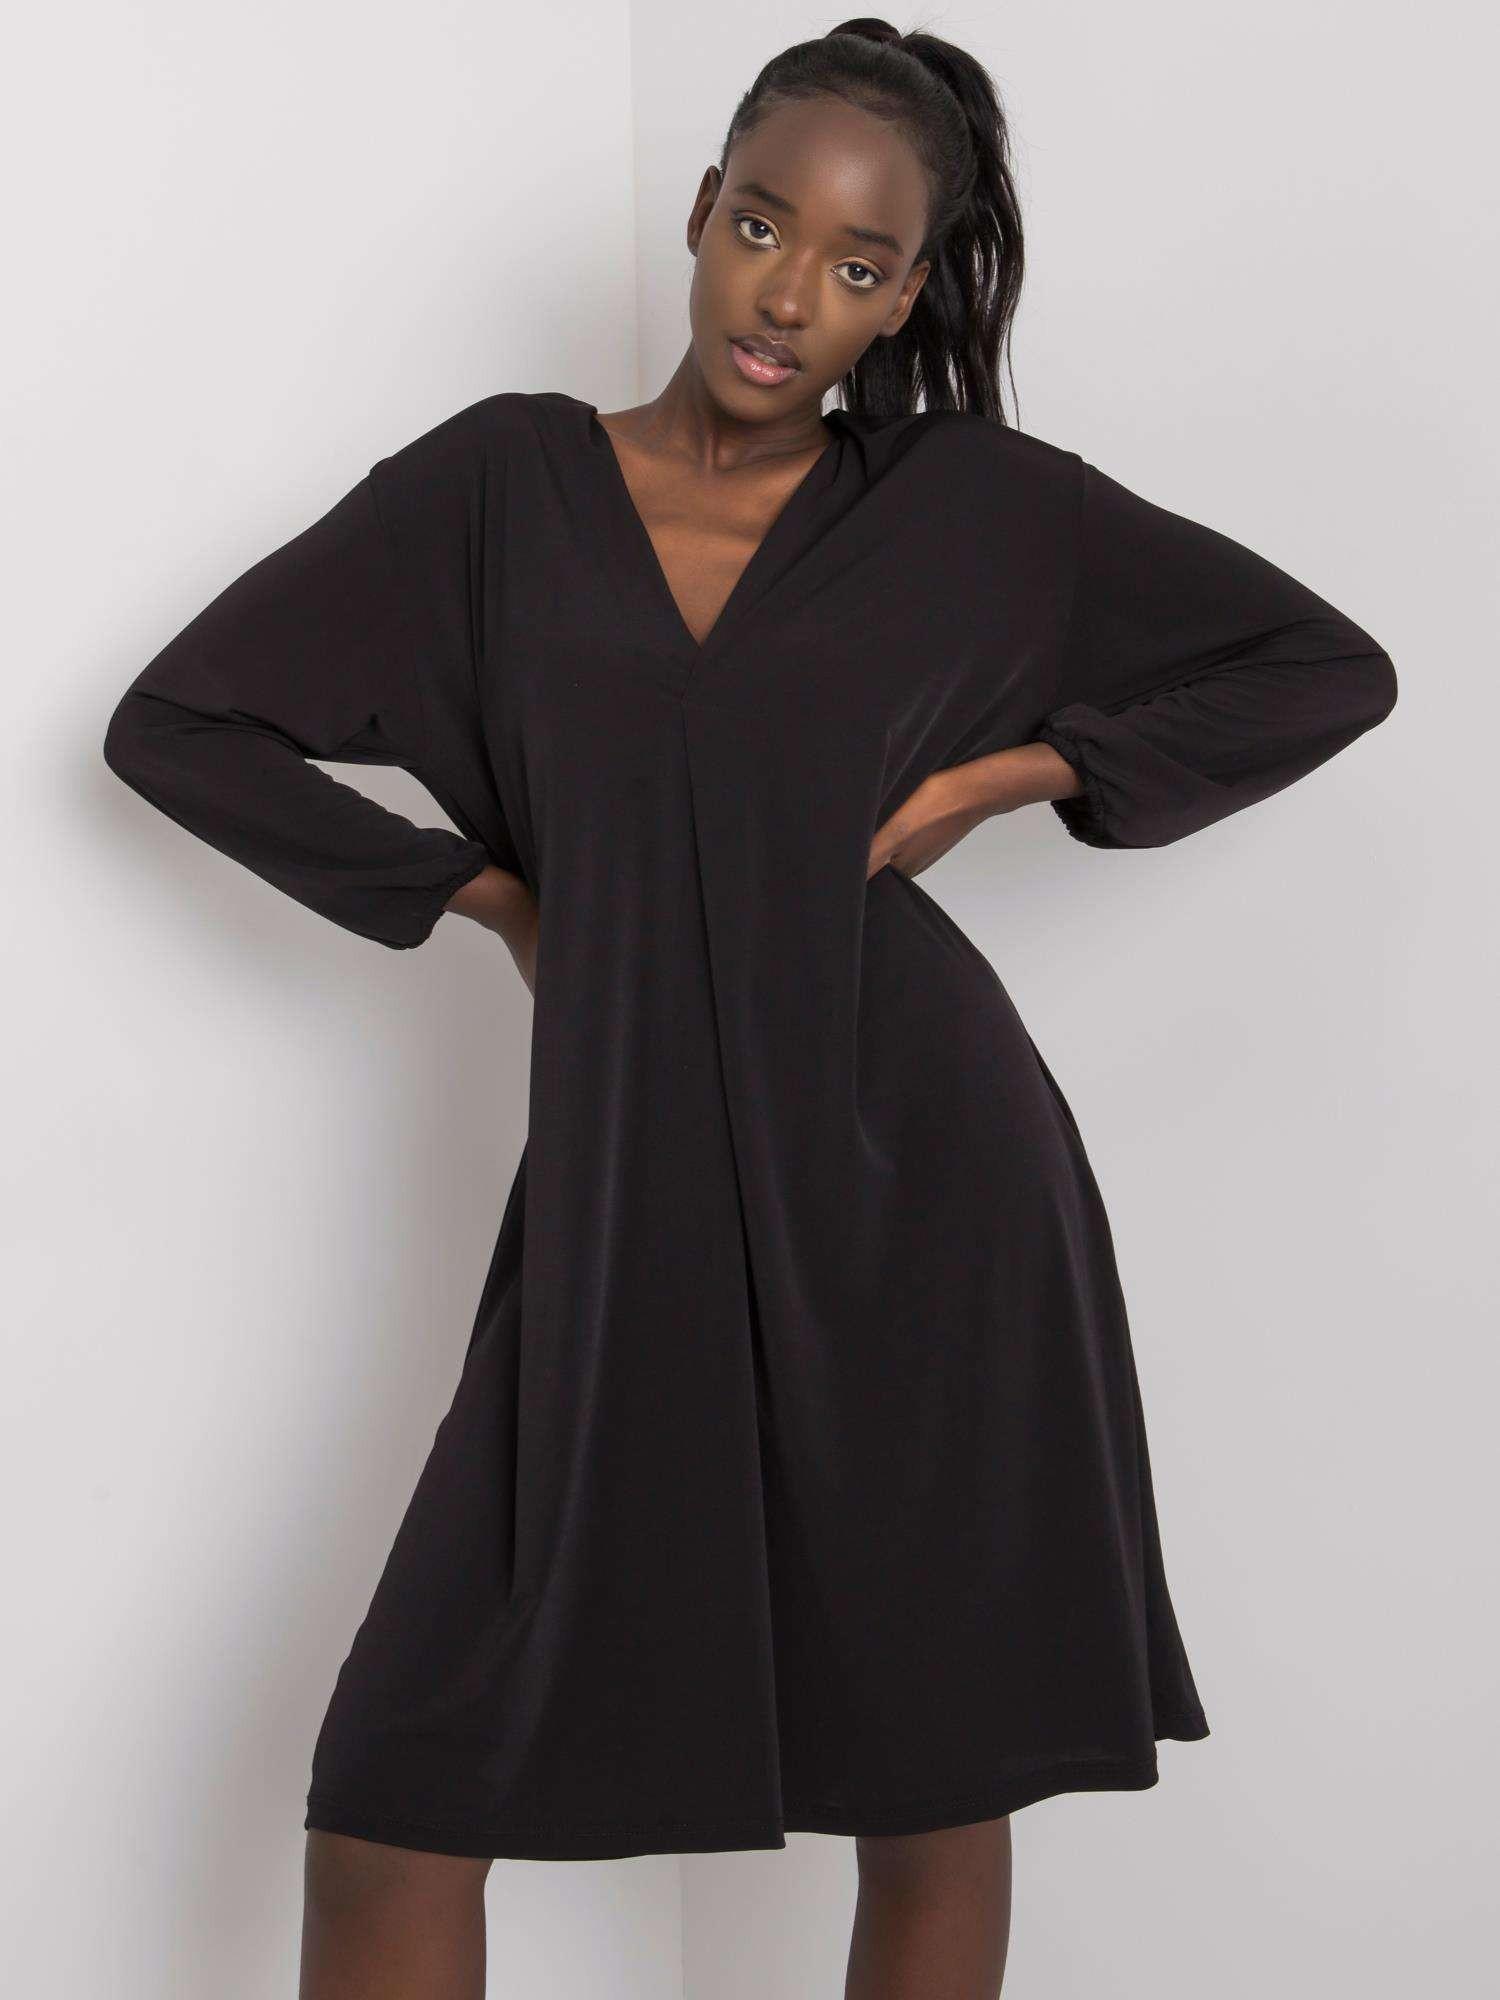 Dámske čierne voľné šaty S